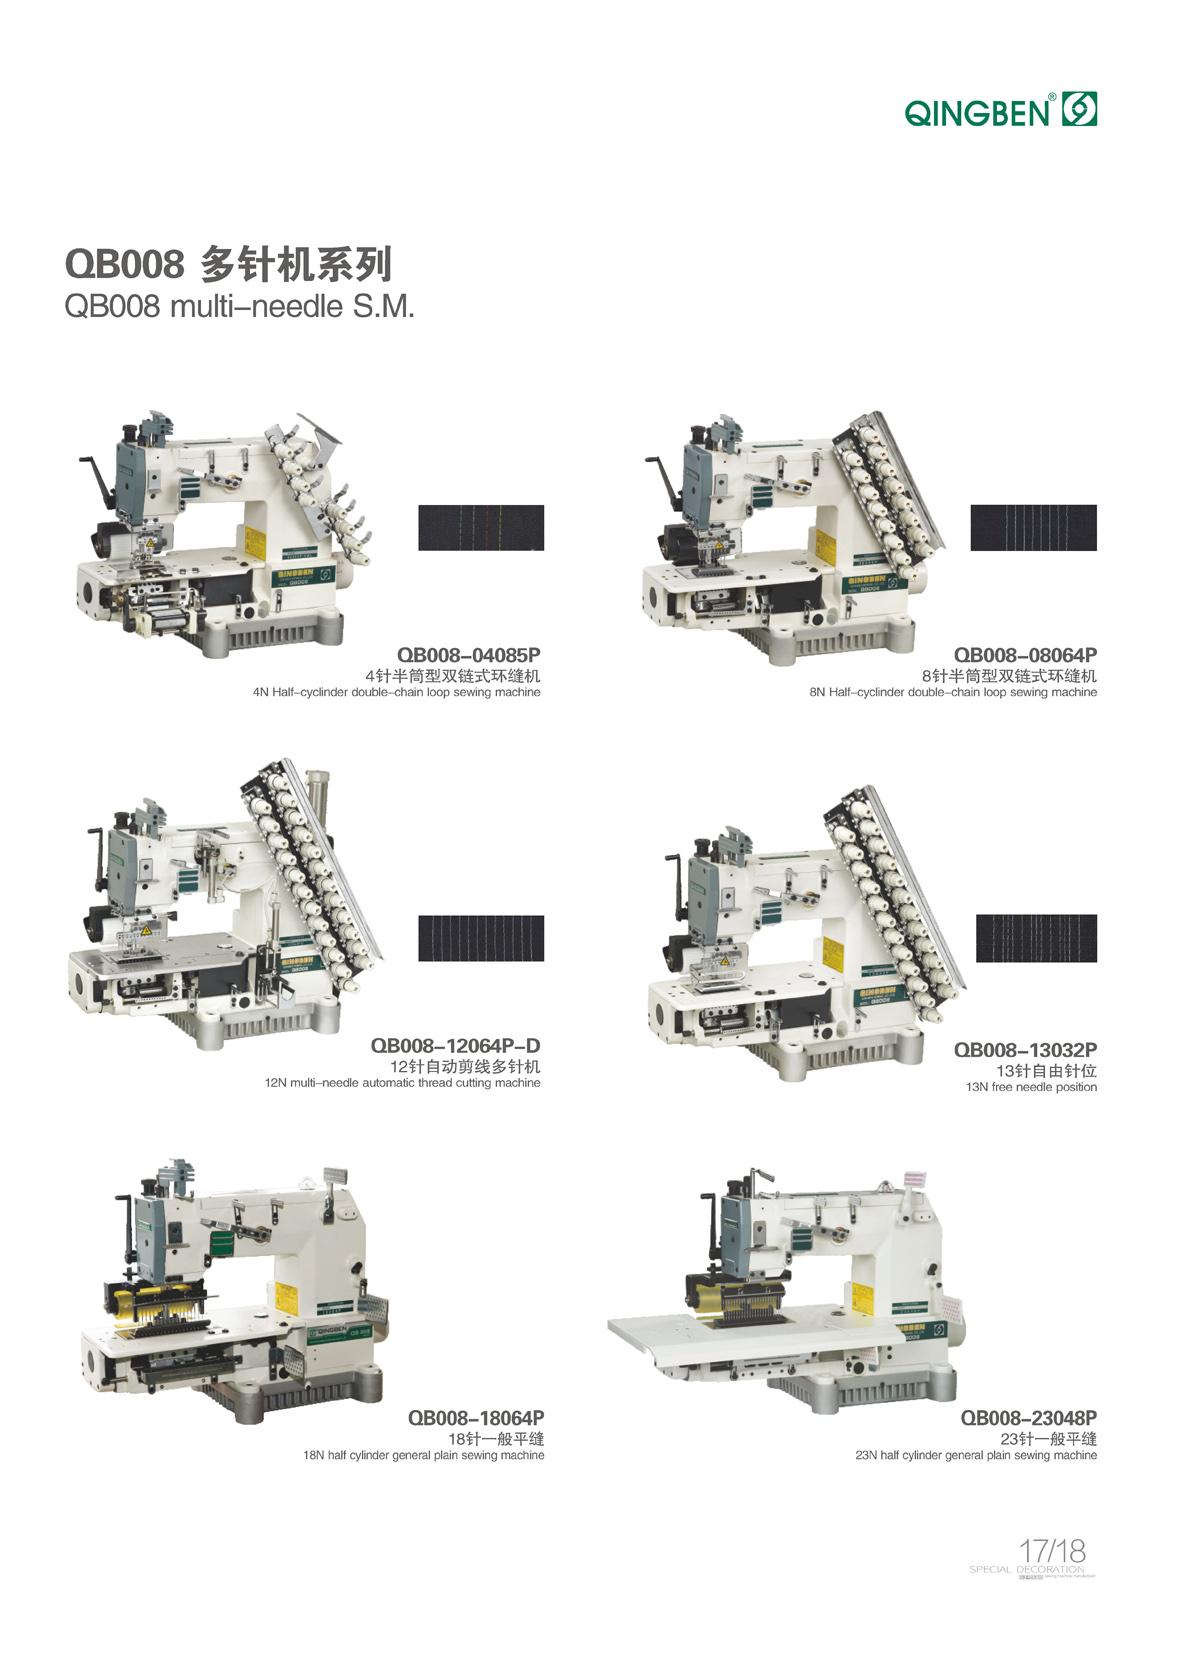 Qb008 12064p D 12n Multi Needle Automatic Thread Cutting Machine Sewing Threading Diagram D12n